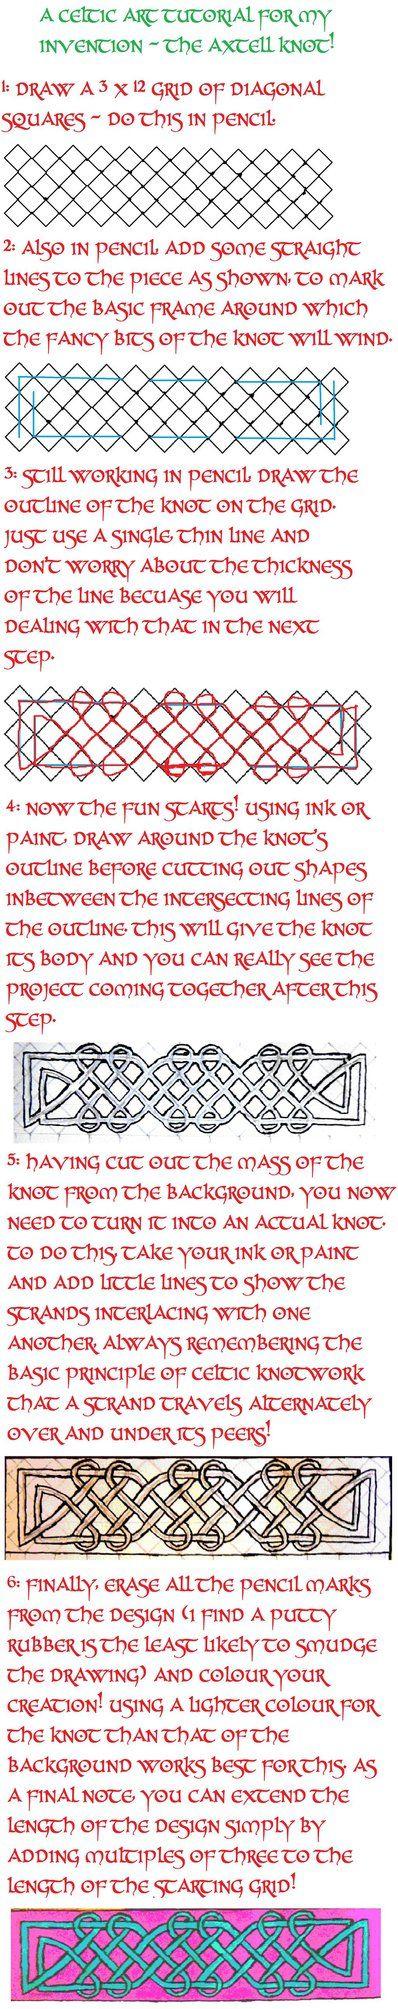 Owl greeting card set welsh artist jen delyth celtic art studio - Celtic Art Tutorial By Thestrategos